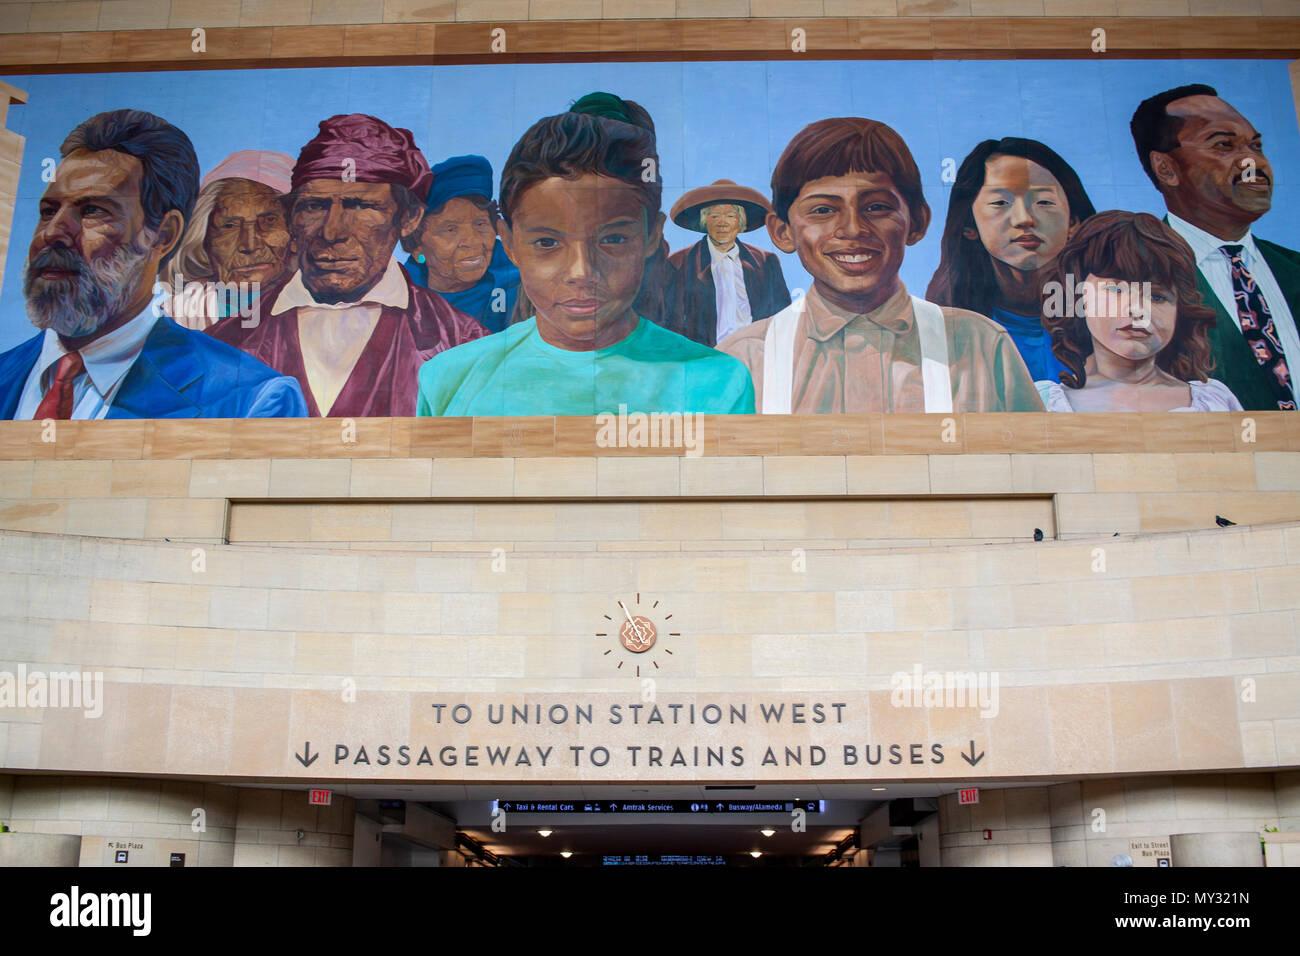 Union Station, Downtown LA. - Stock Image